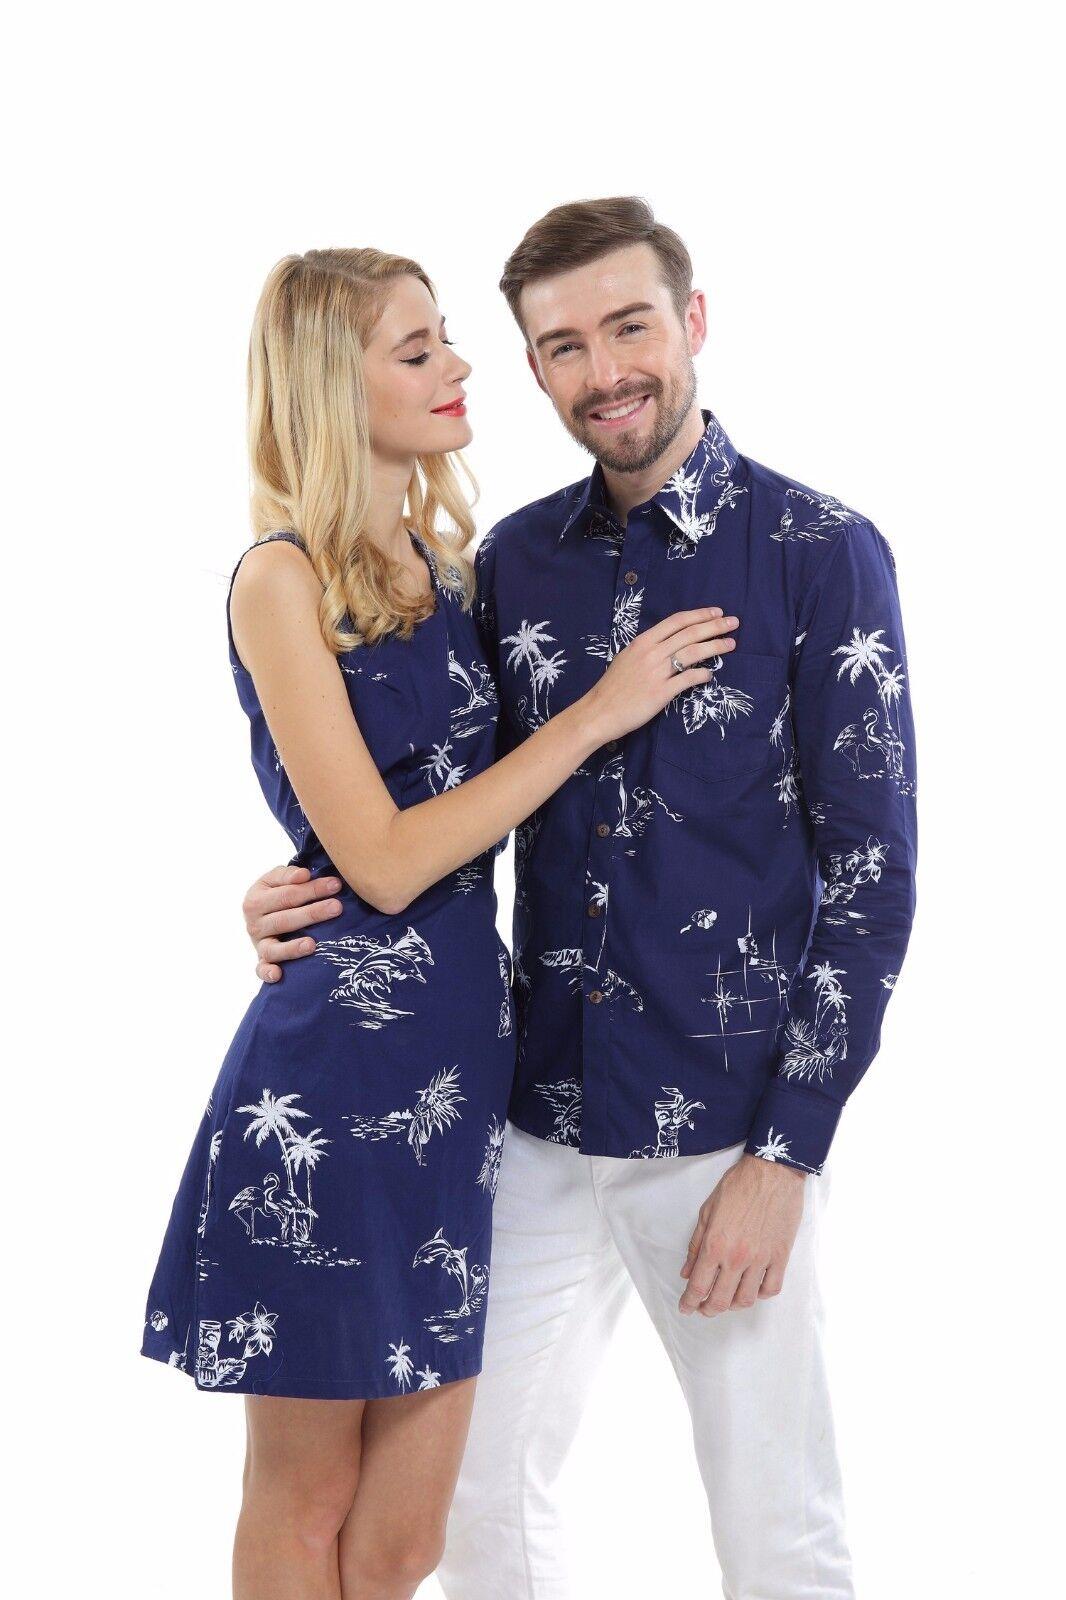 Vintage Classic Couple Matching Long Sleeve Shirt Dress Outfit Hawaiian Navy